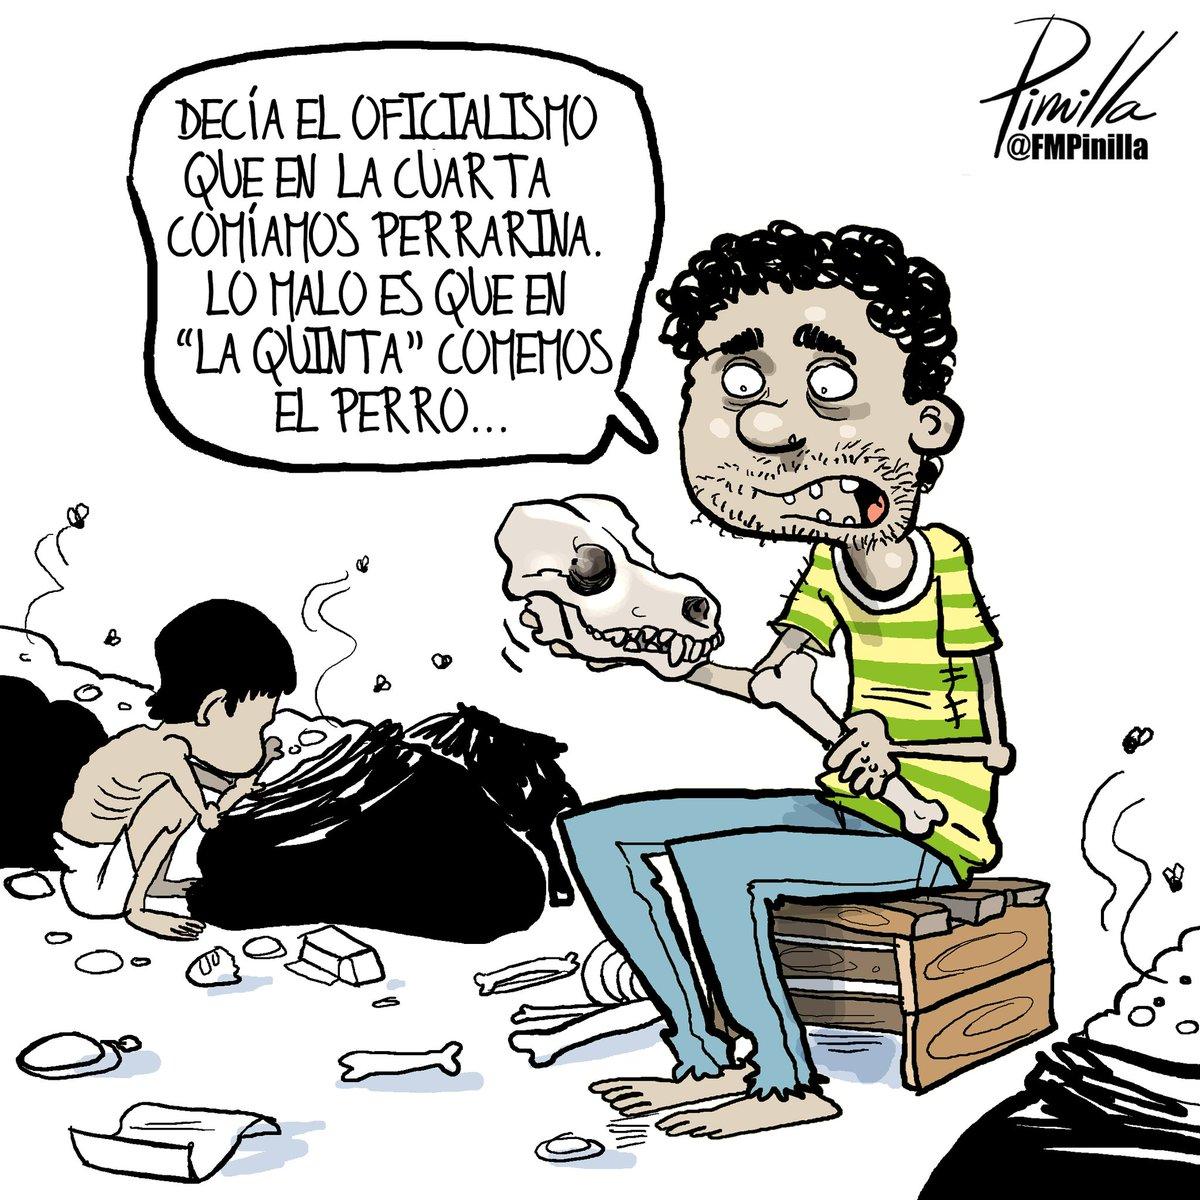 Venezuela crisis economica - Página 39 DXwi-BVXkAE3Zh6-1